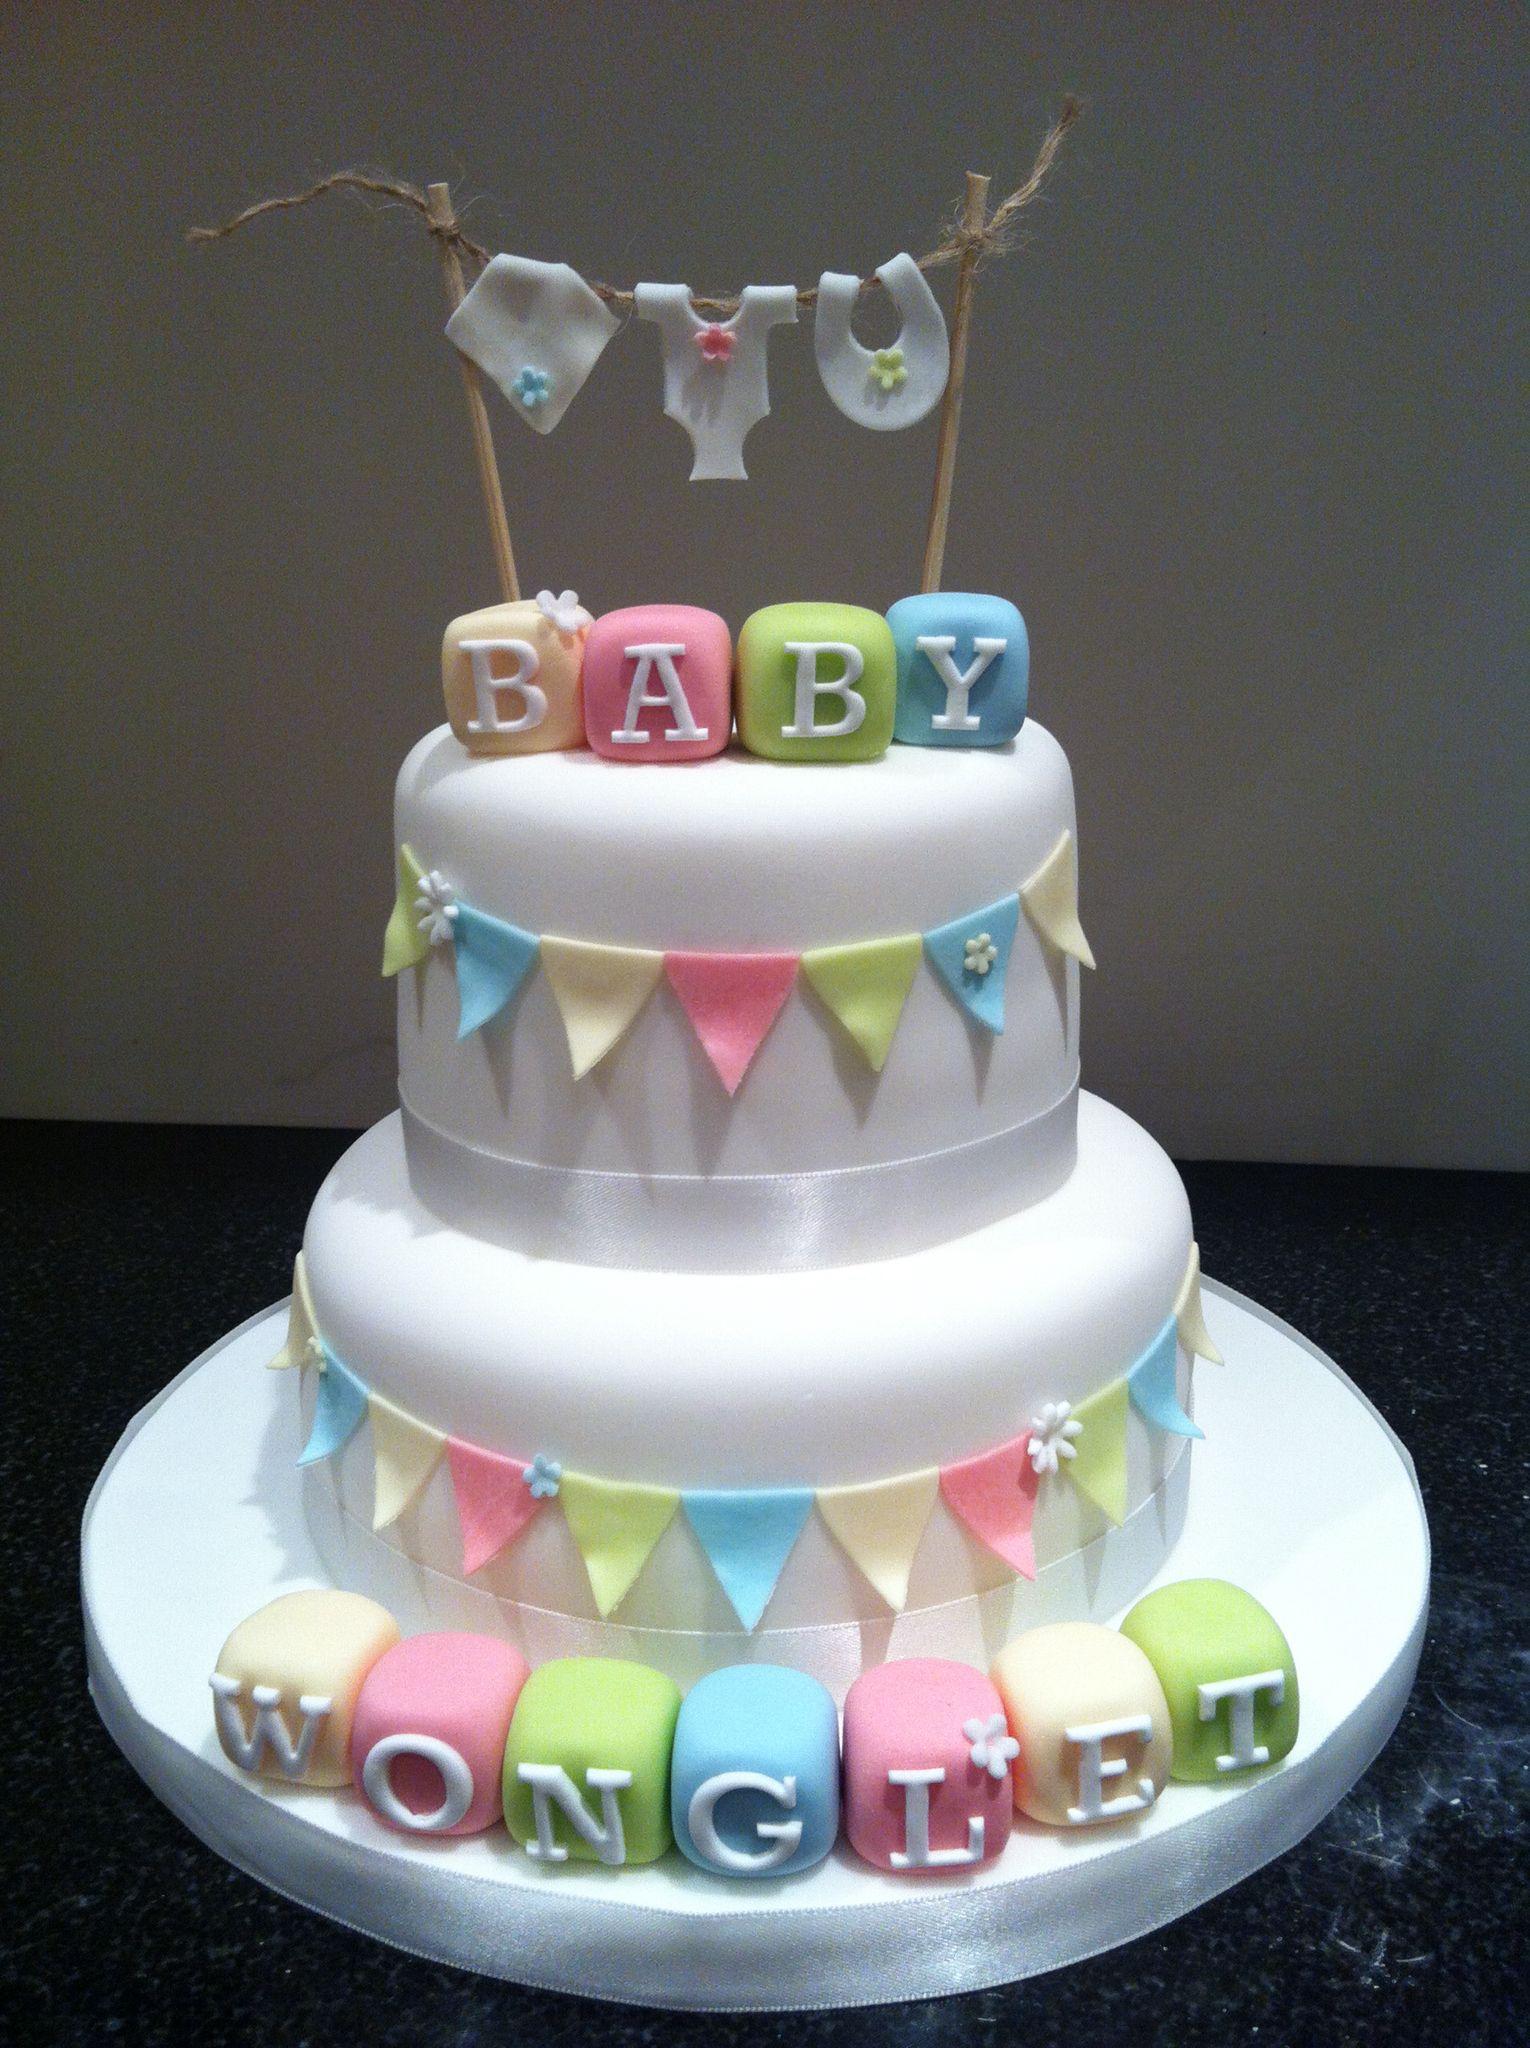 Original tarta para celebración de Baby shower. #babyshower #tarta #pastel